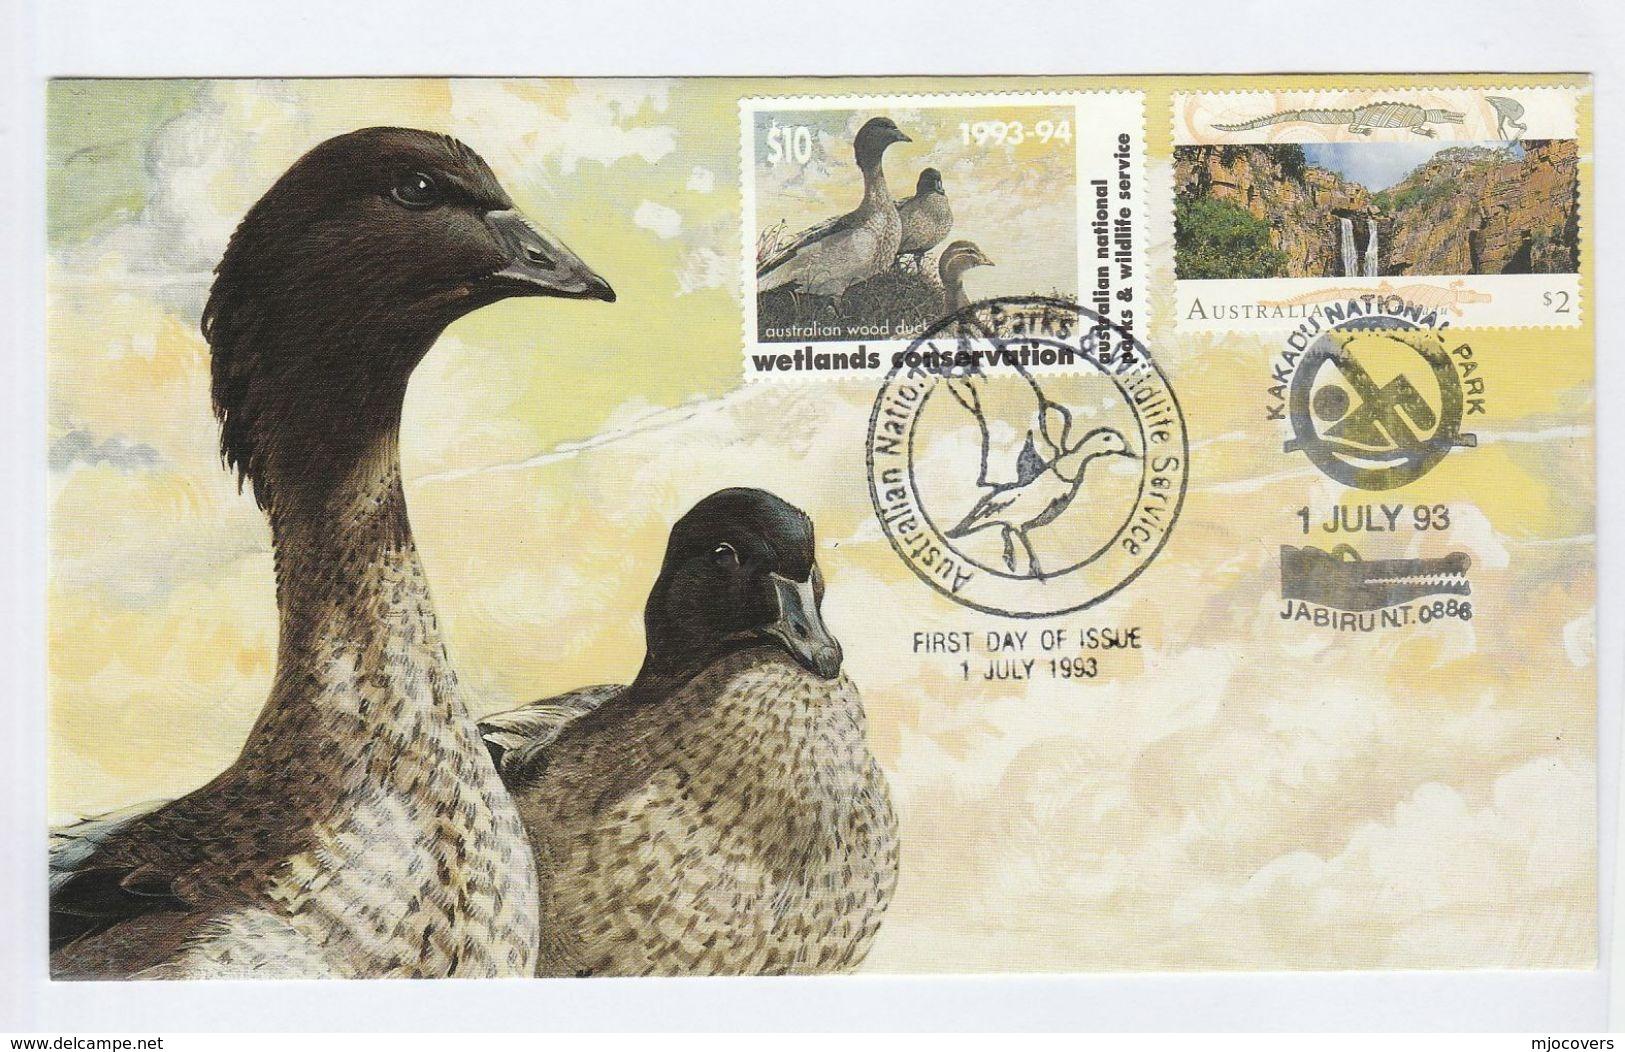 1993 AUSTRALIA FDC $2 With $10 Wetland CONSERVATION DUCKS Label SPECIAL Pmk KAKADU NATIONAL PARK Cover Stamp Bird Birds - Ducks